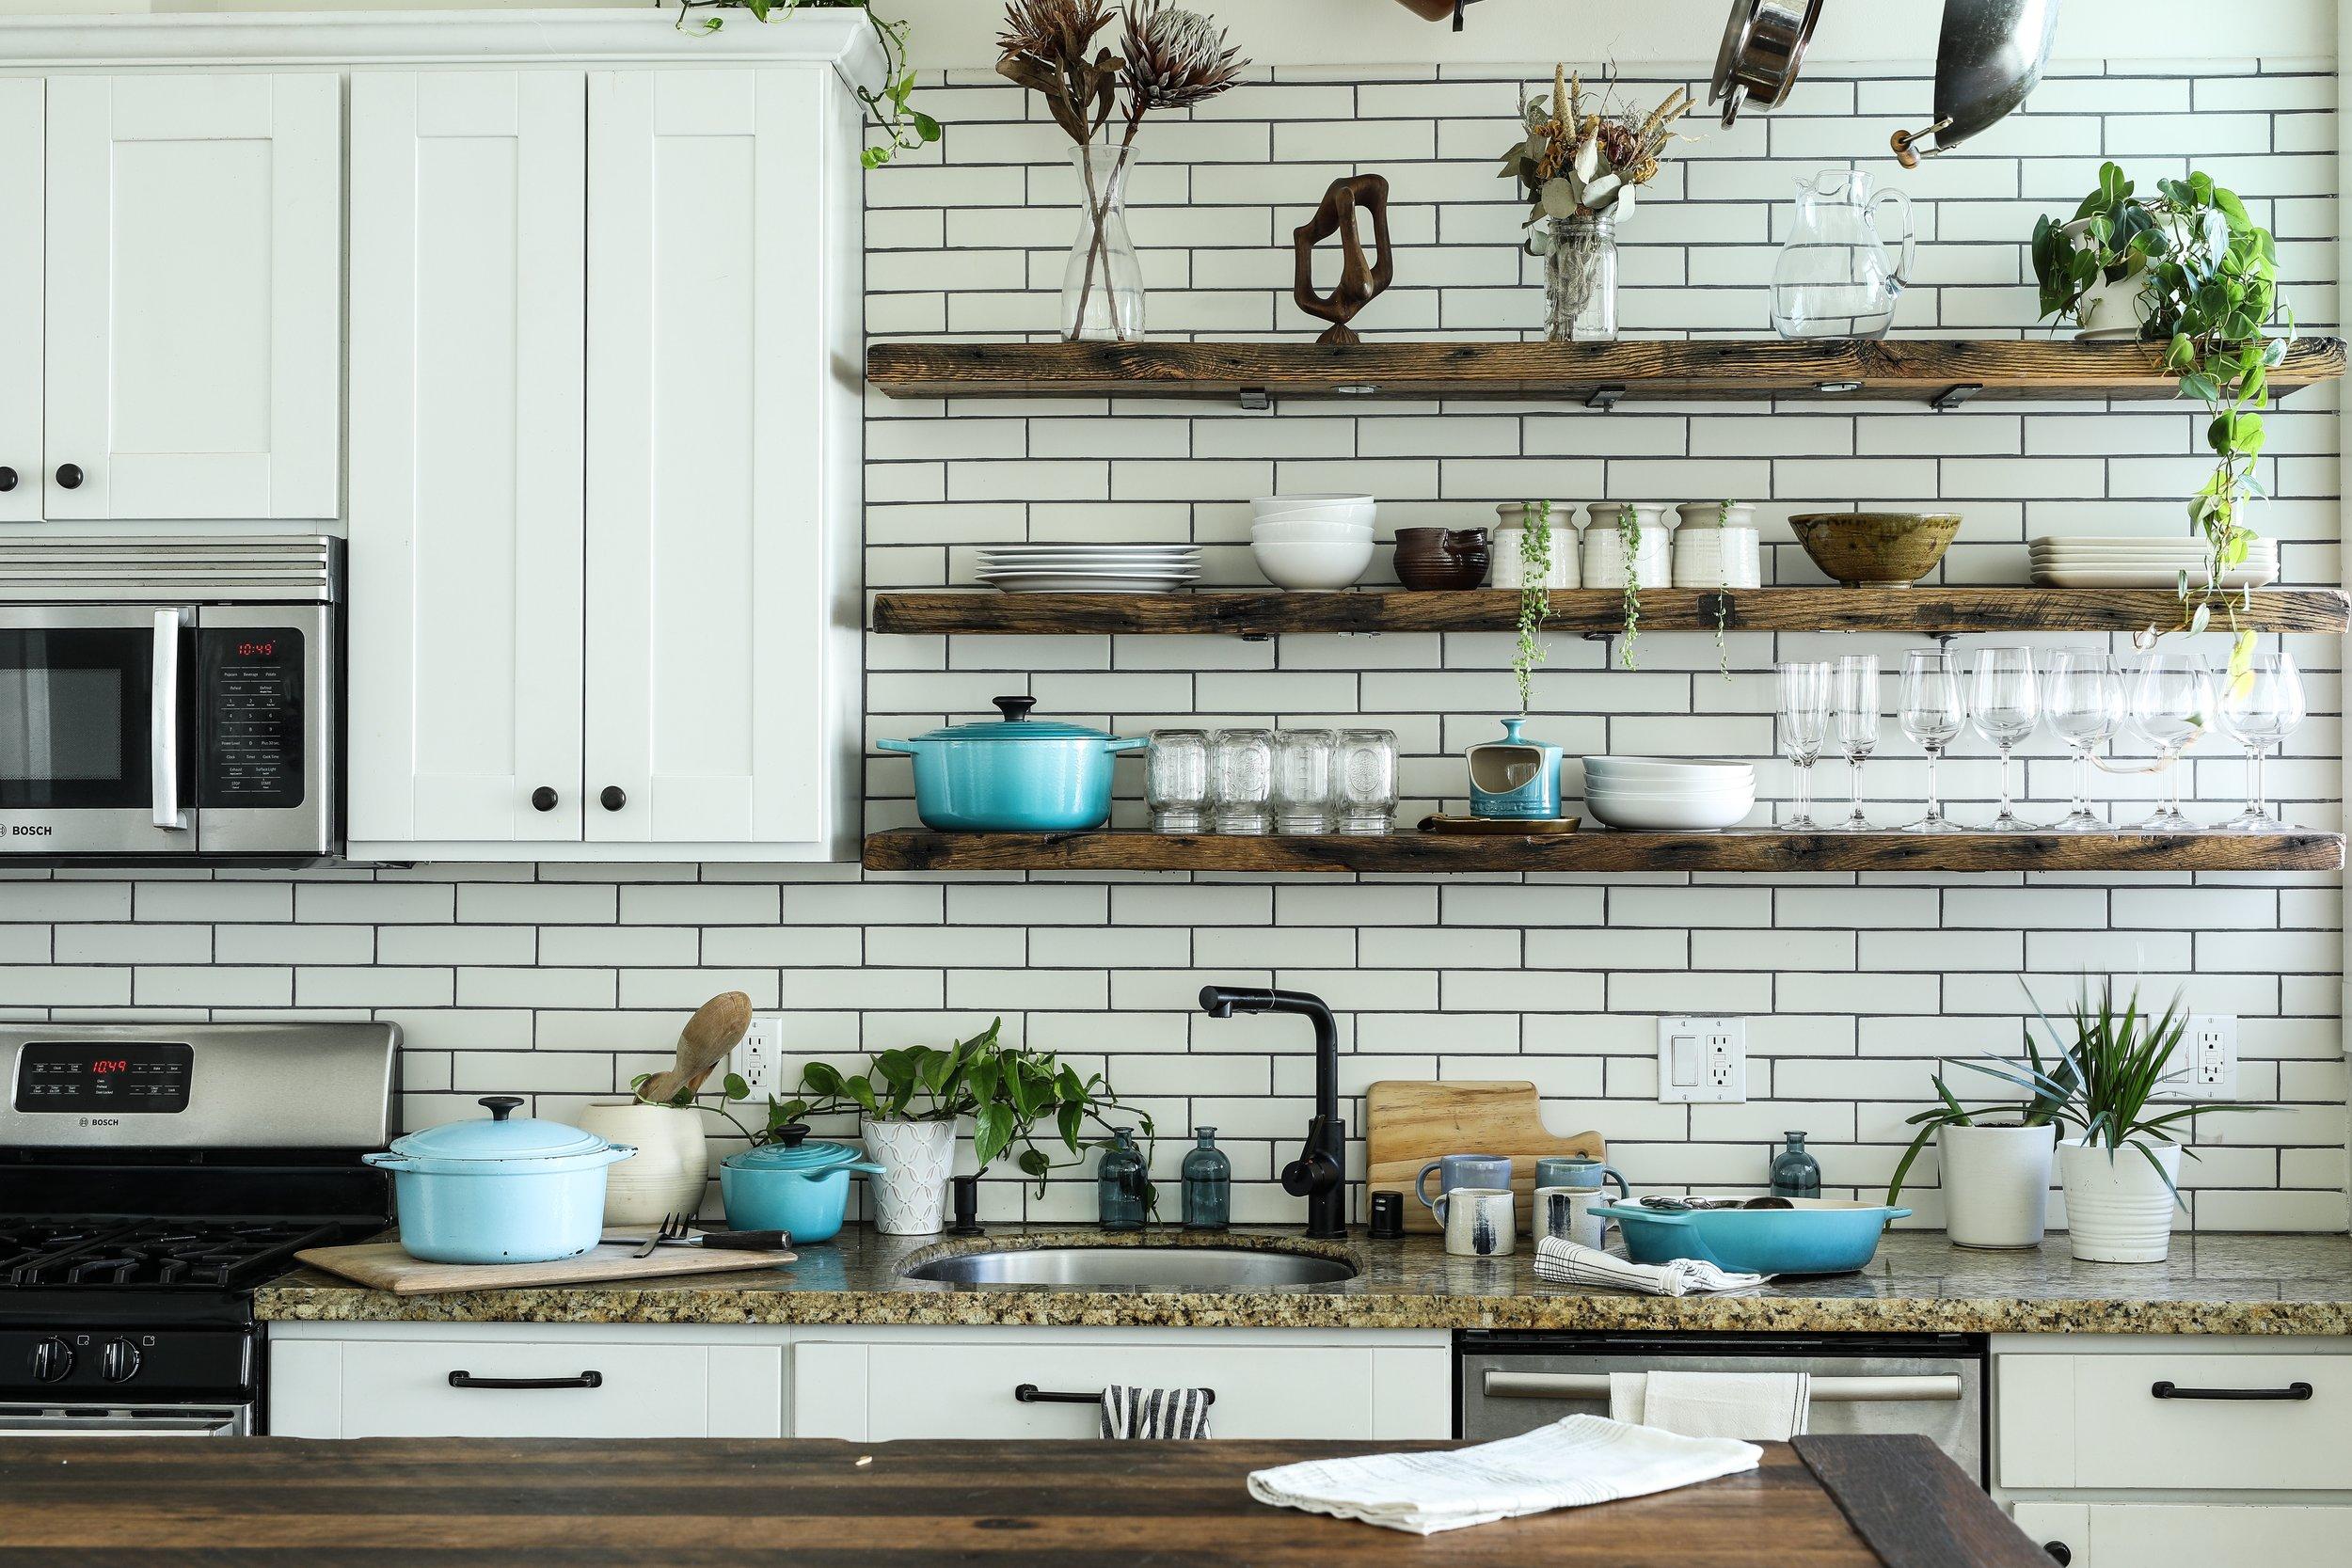 Organized kitchen with greenery.jpg